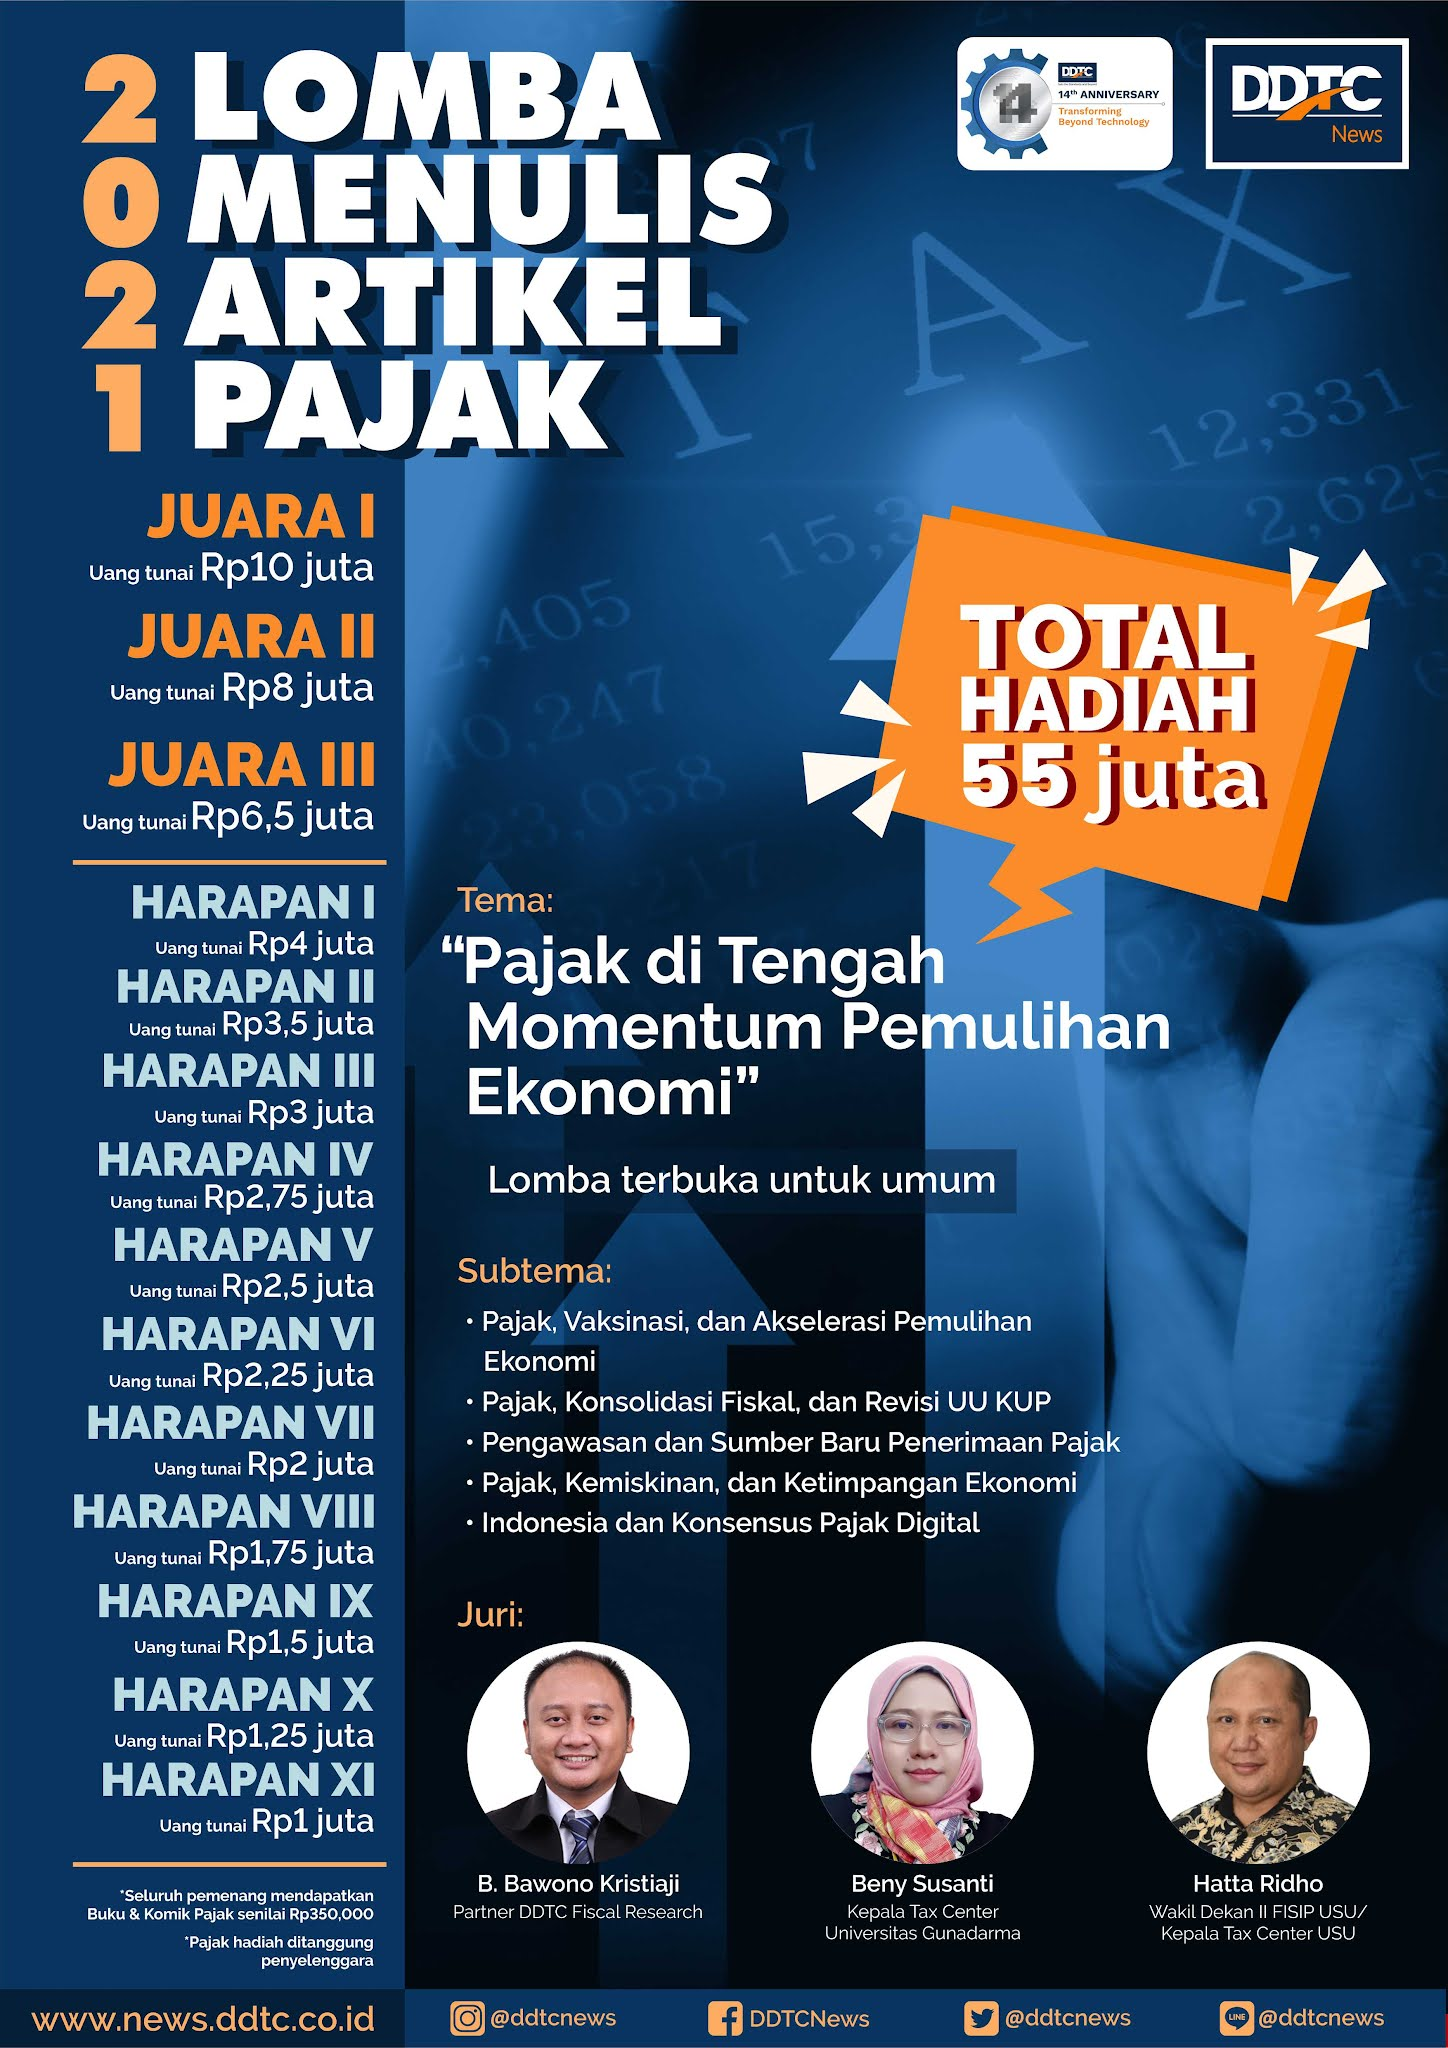 Lomba Menulis Artikel Pajak Berhadiah Total 55 Juta Rupiah oleh DDTCNews